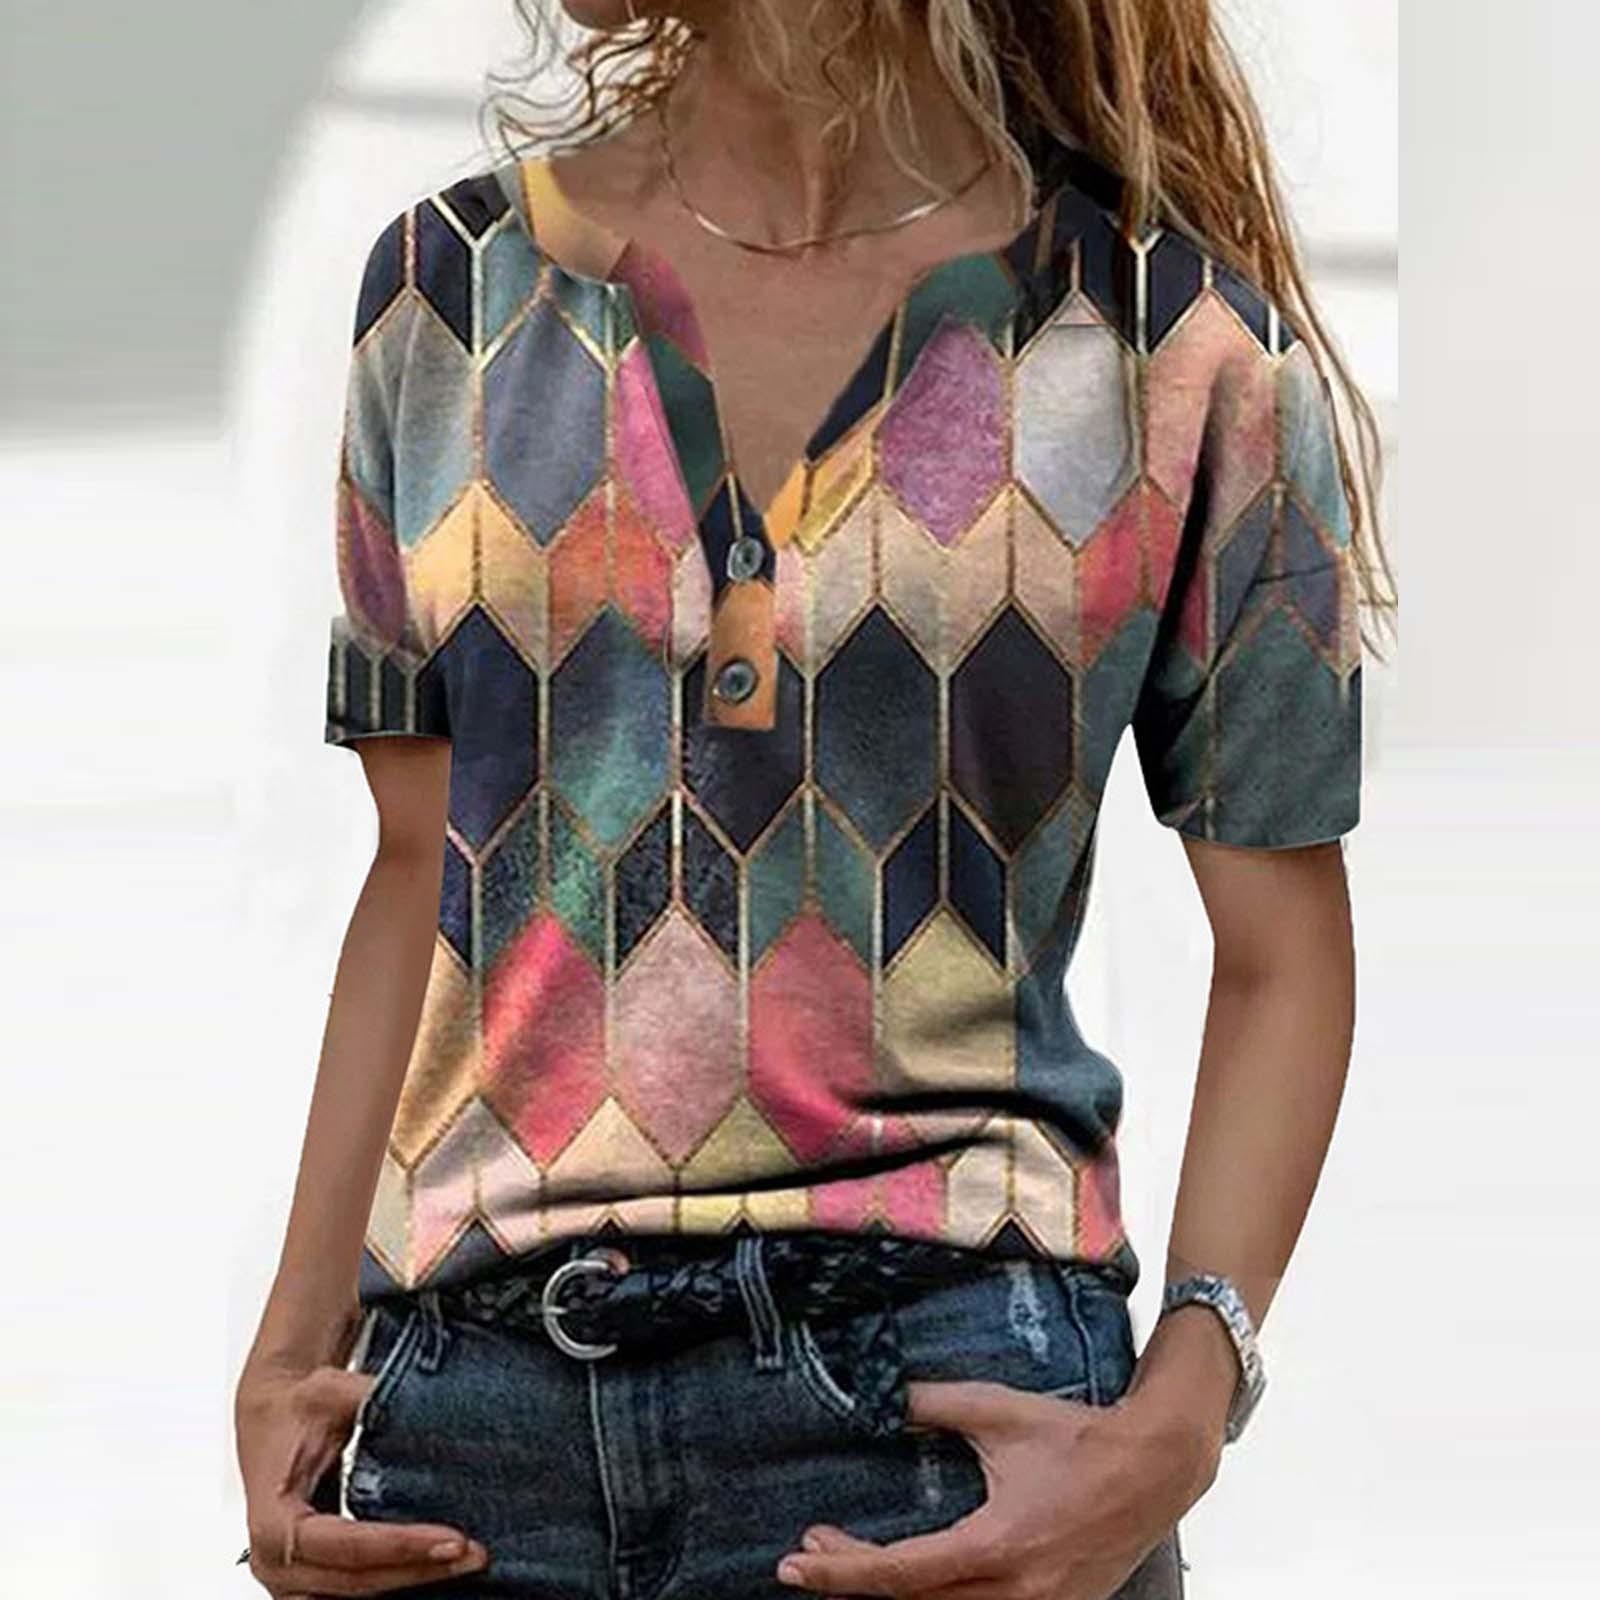 4# Women's Summer V neck Blouses Printed Short Sleeve V  Neck Collar Tops Shirts Vintage Office Lady Рубашка Женская Блузка